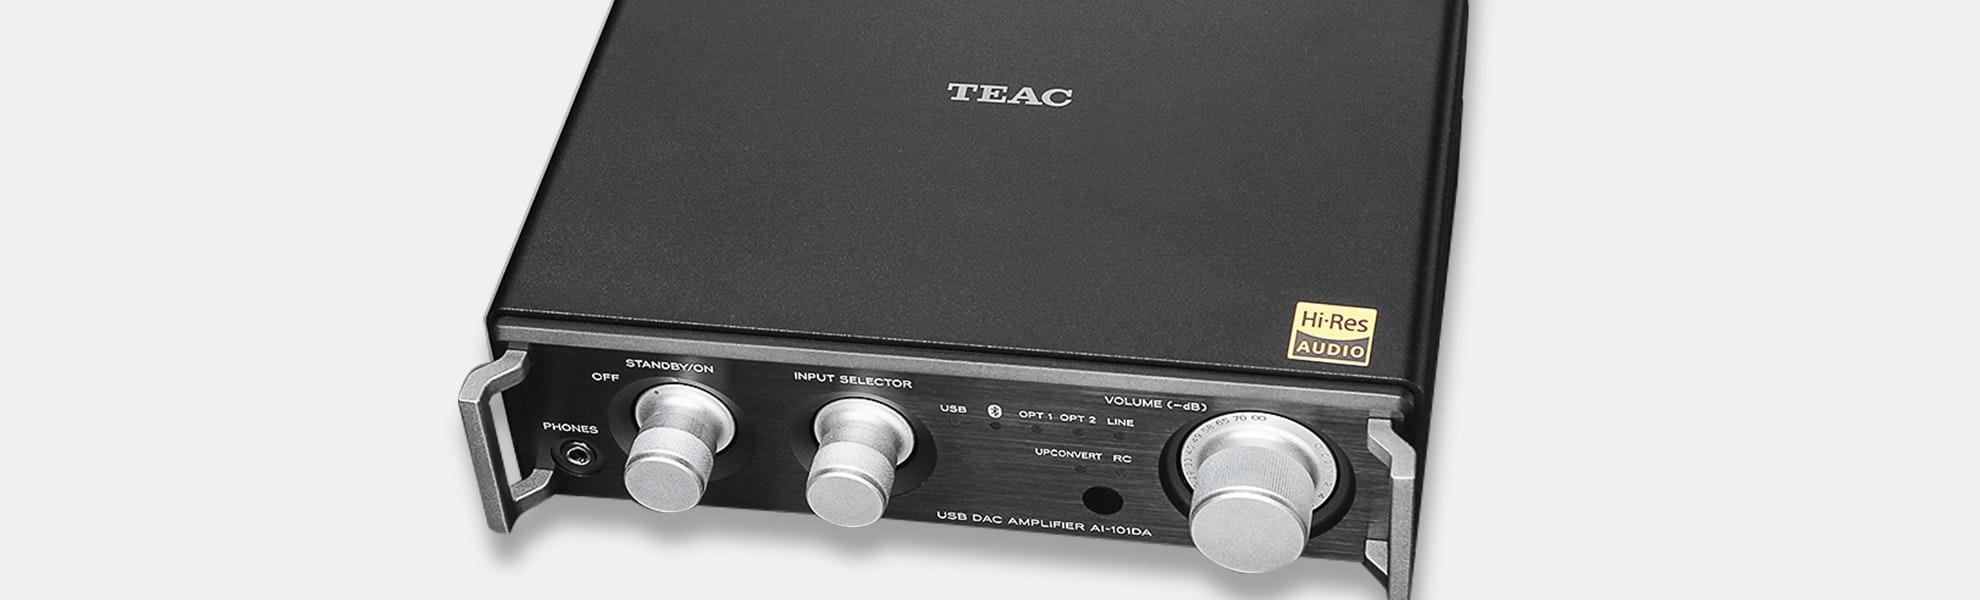 TEAC AI-101DA Integrated Amplifier with USB DAC